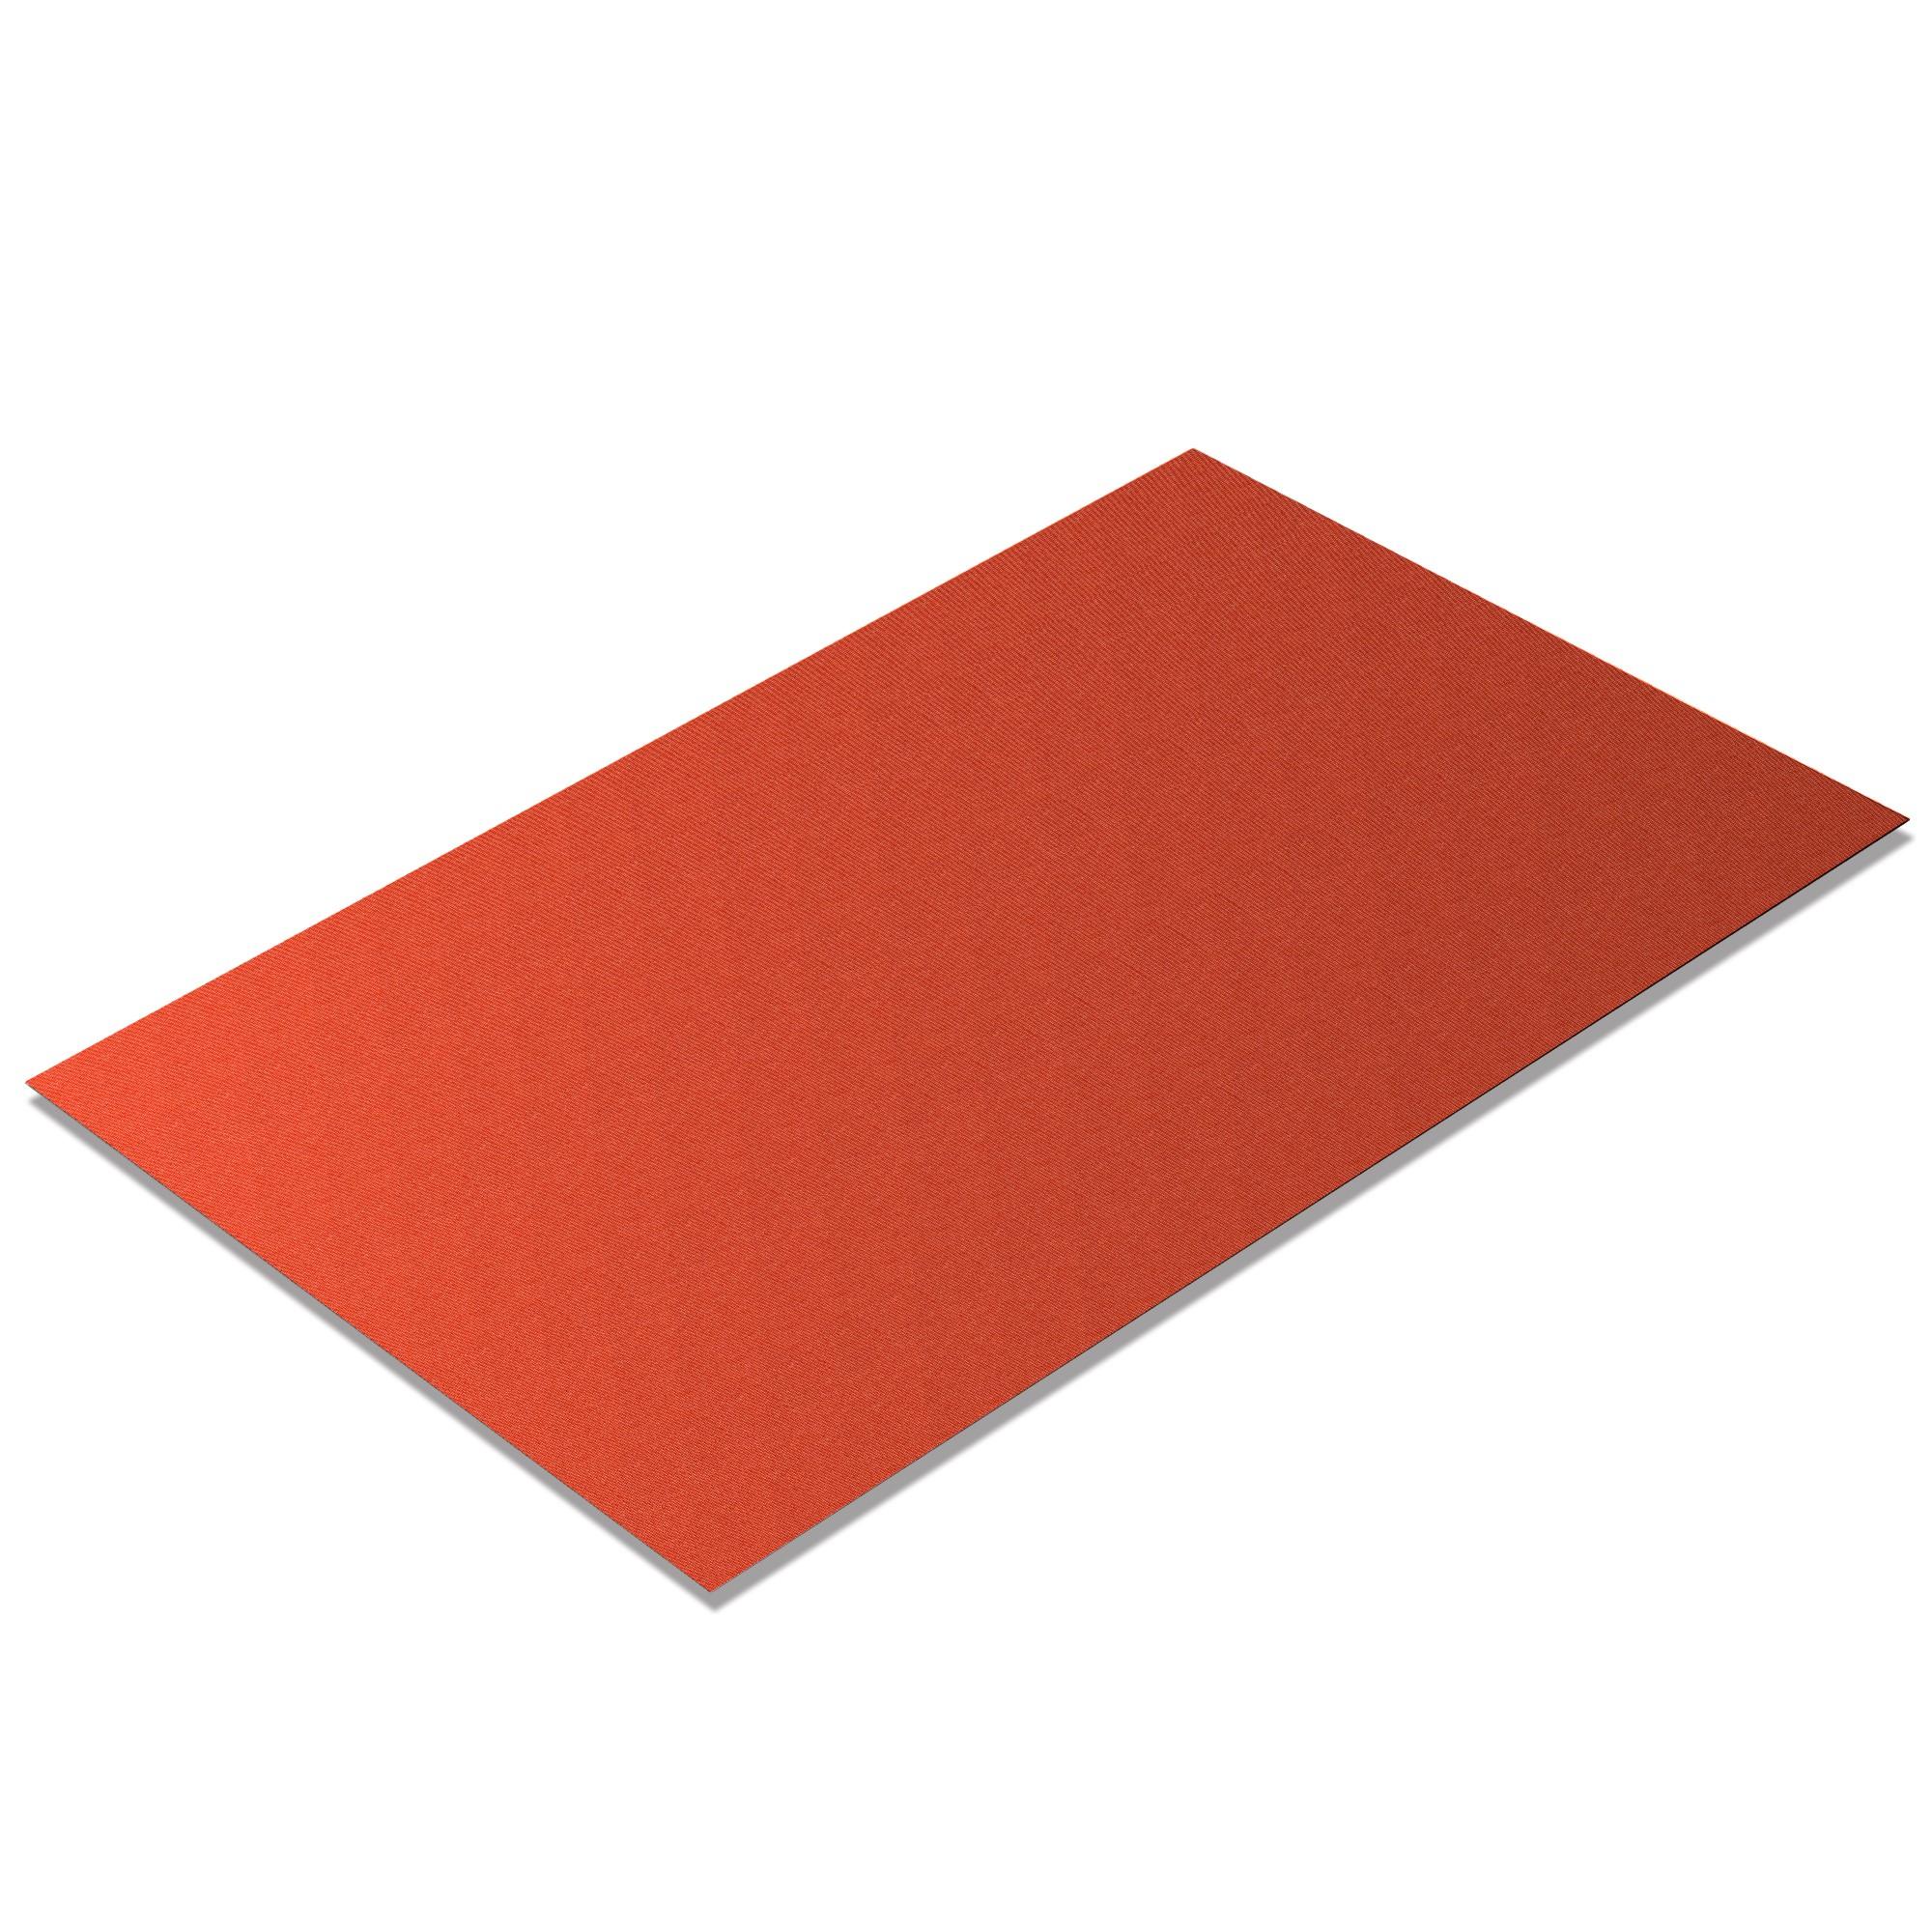 Stoff Meterware Indiana Orange [IND29]